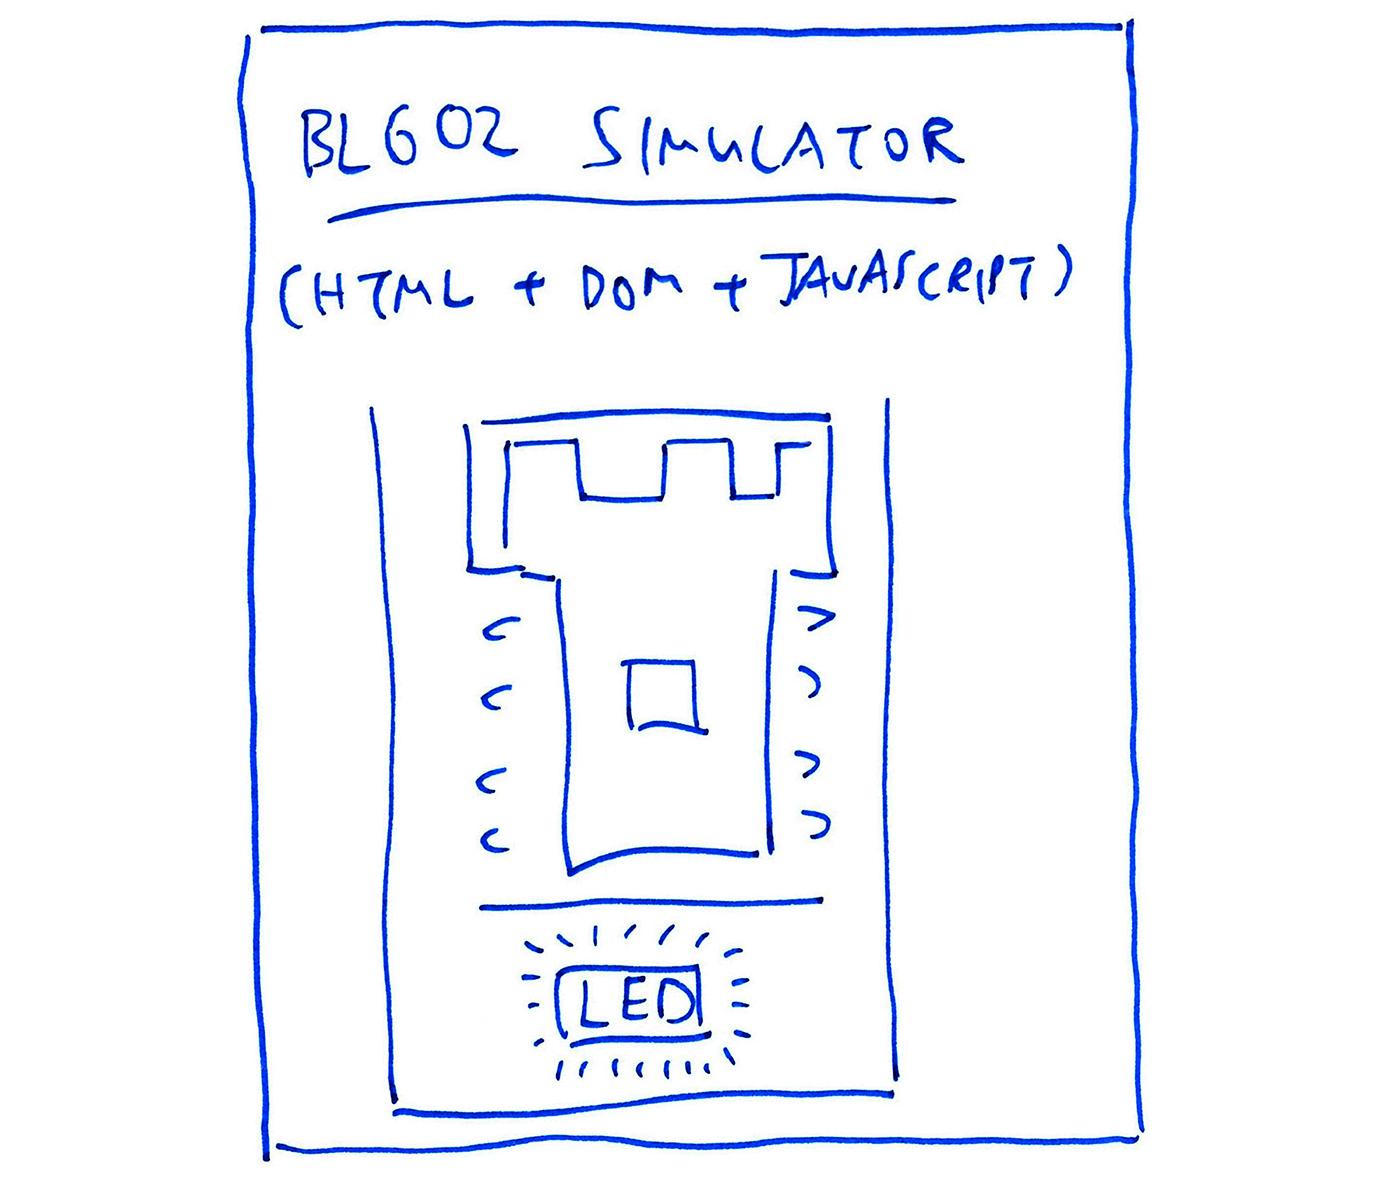 BL602 Simulator in HTML and JavaScript